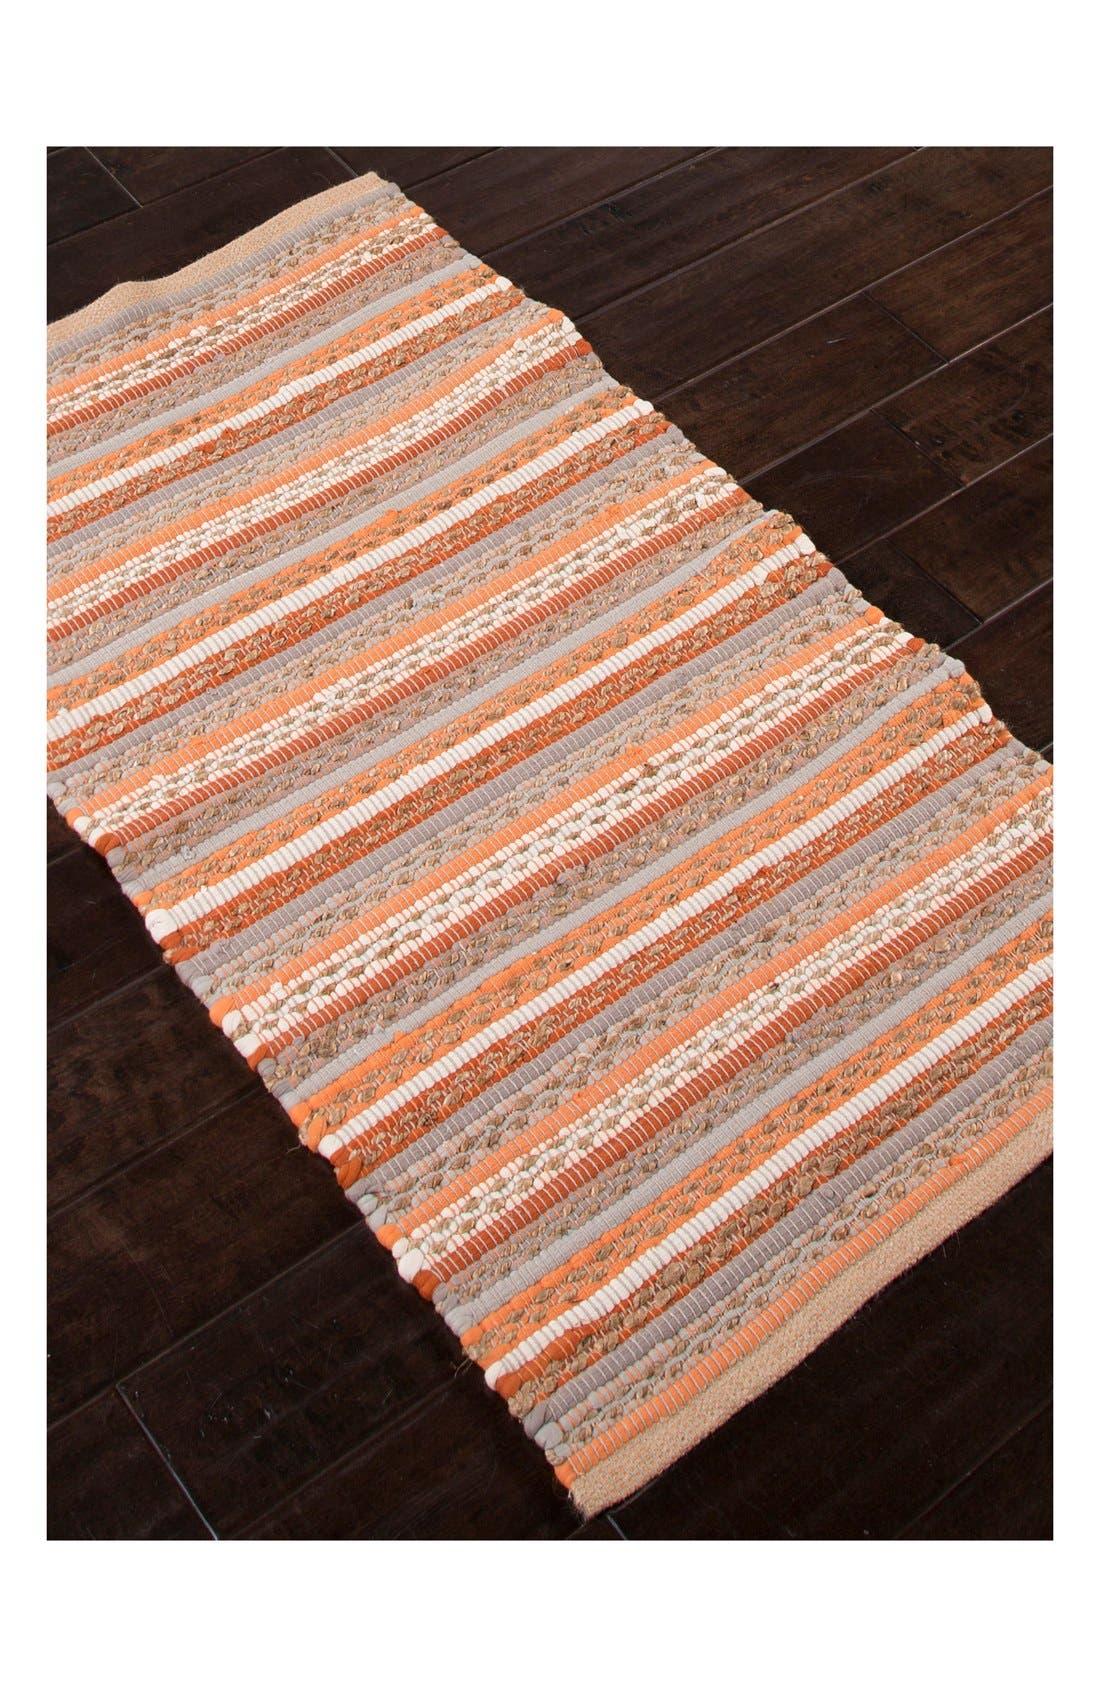 Alternate Image 3  - Jaipur 'Croydon' Cotton & Jute Accent Rug